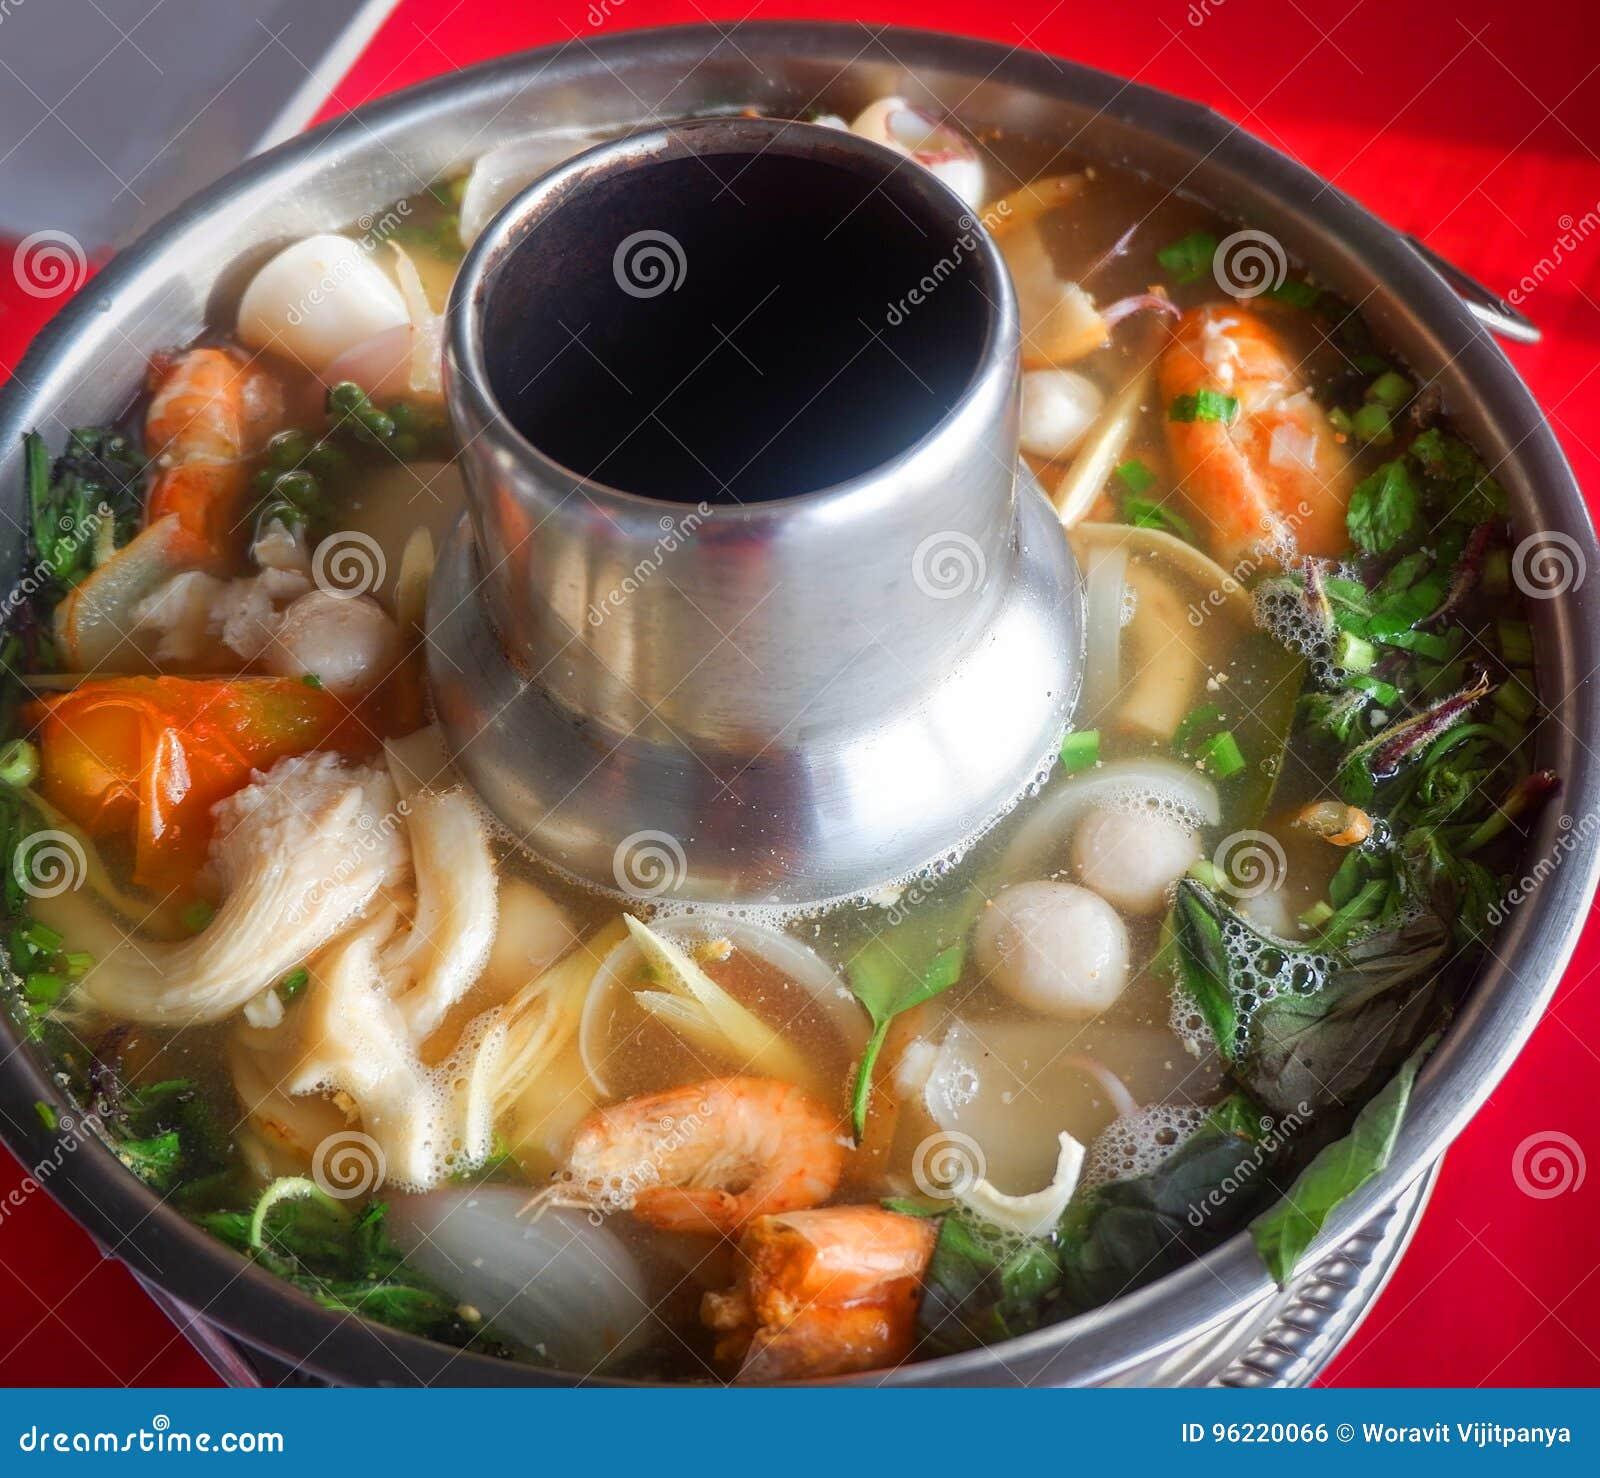 Tom Yum Goong in hot pot